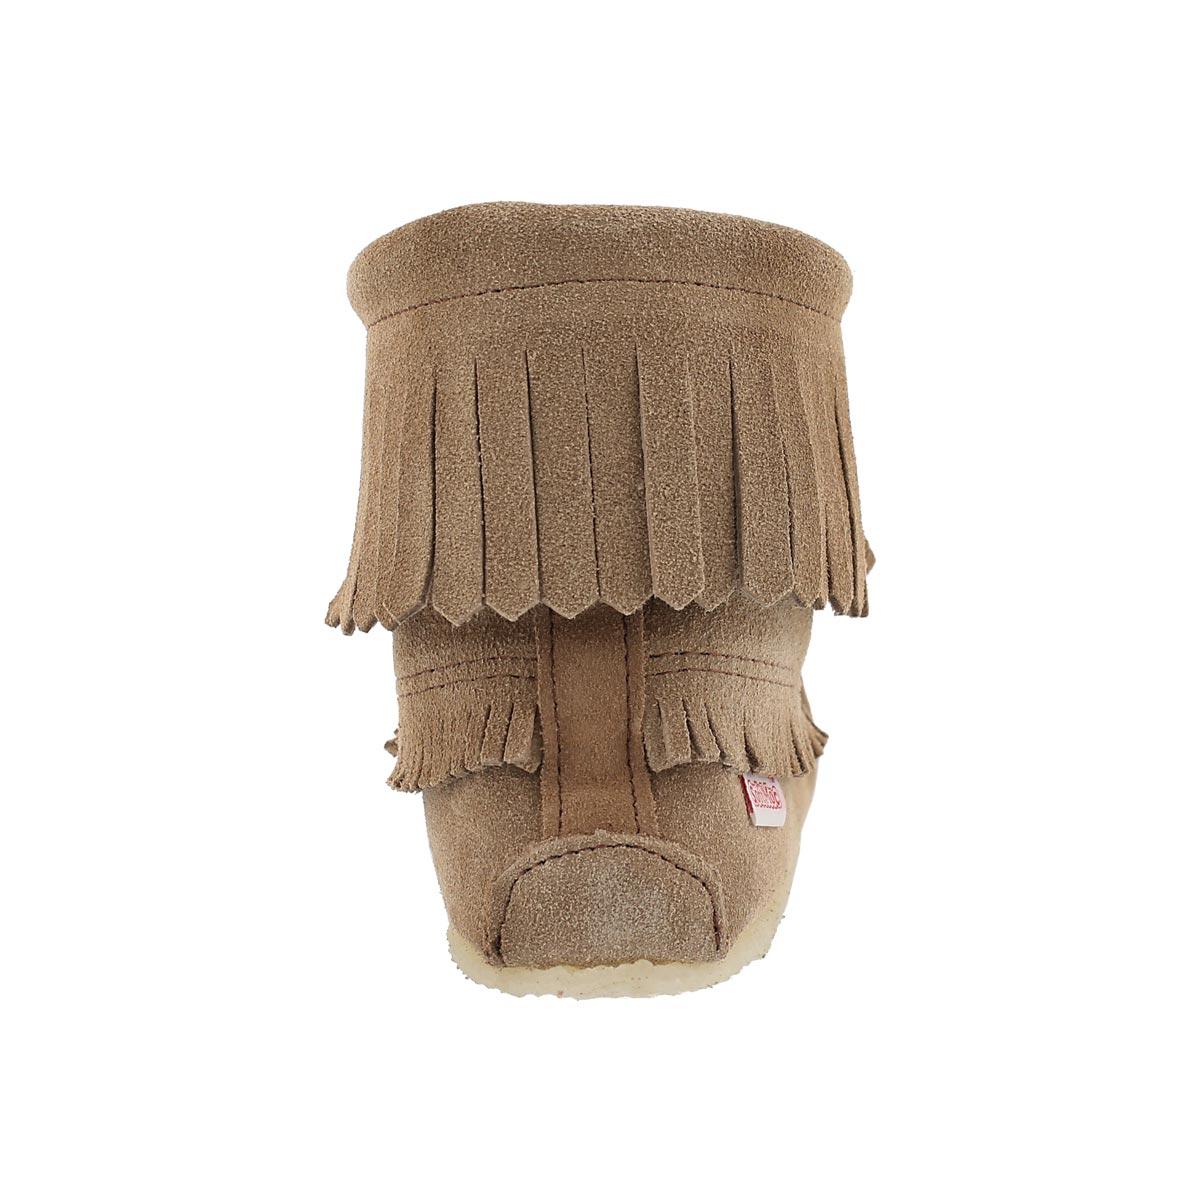 Mocassins bottines à frange moka, femmes